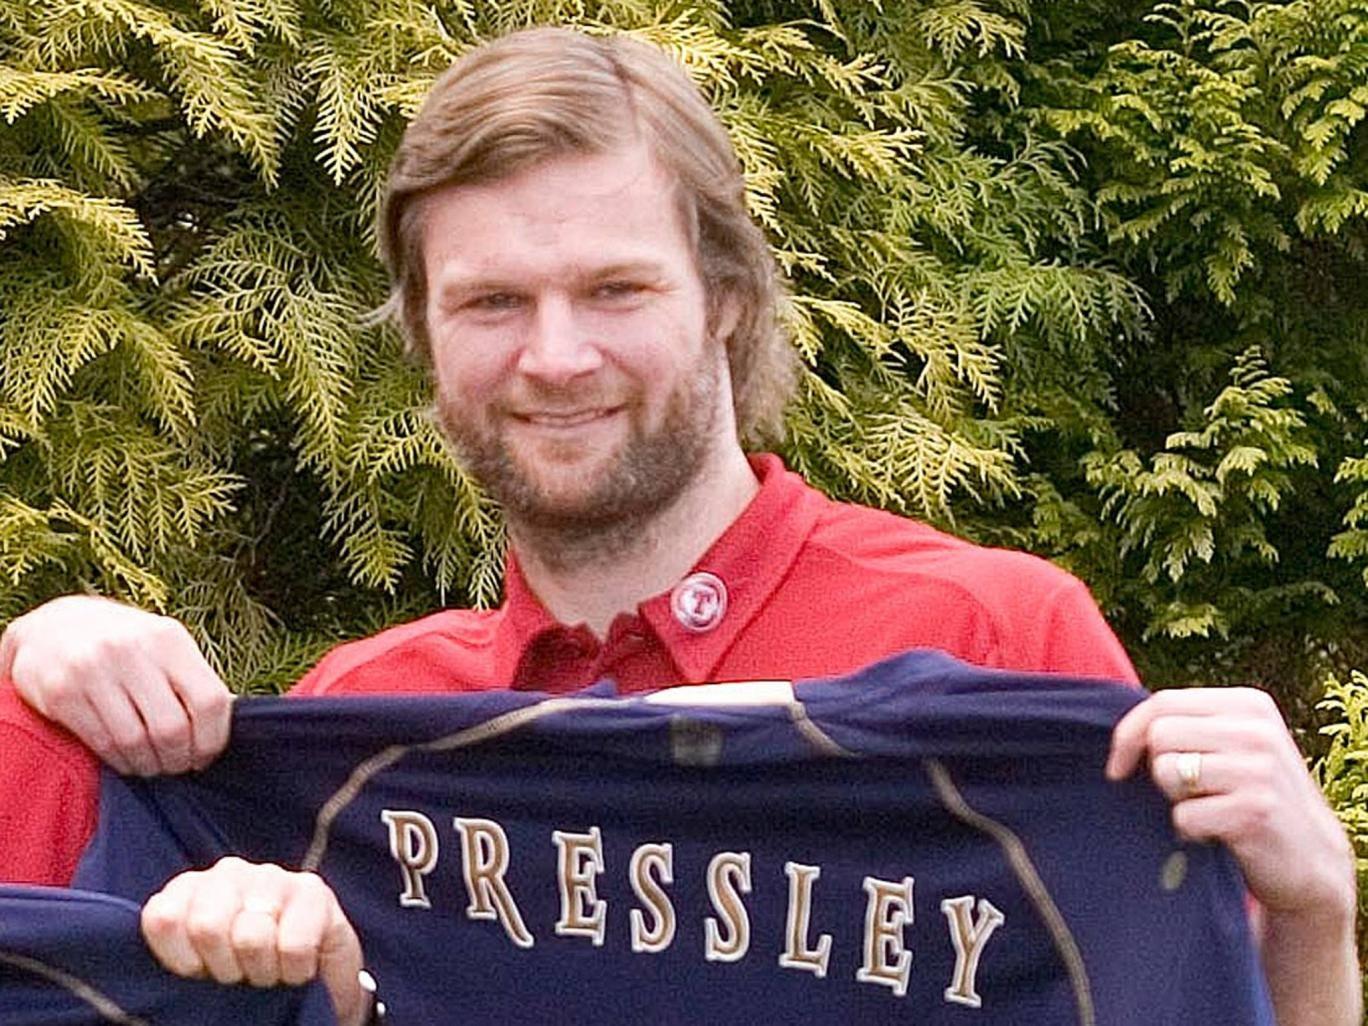 Steven Pressley